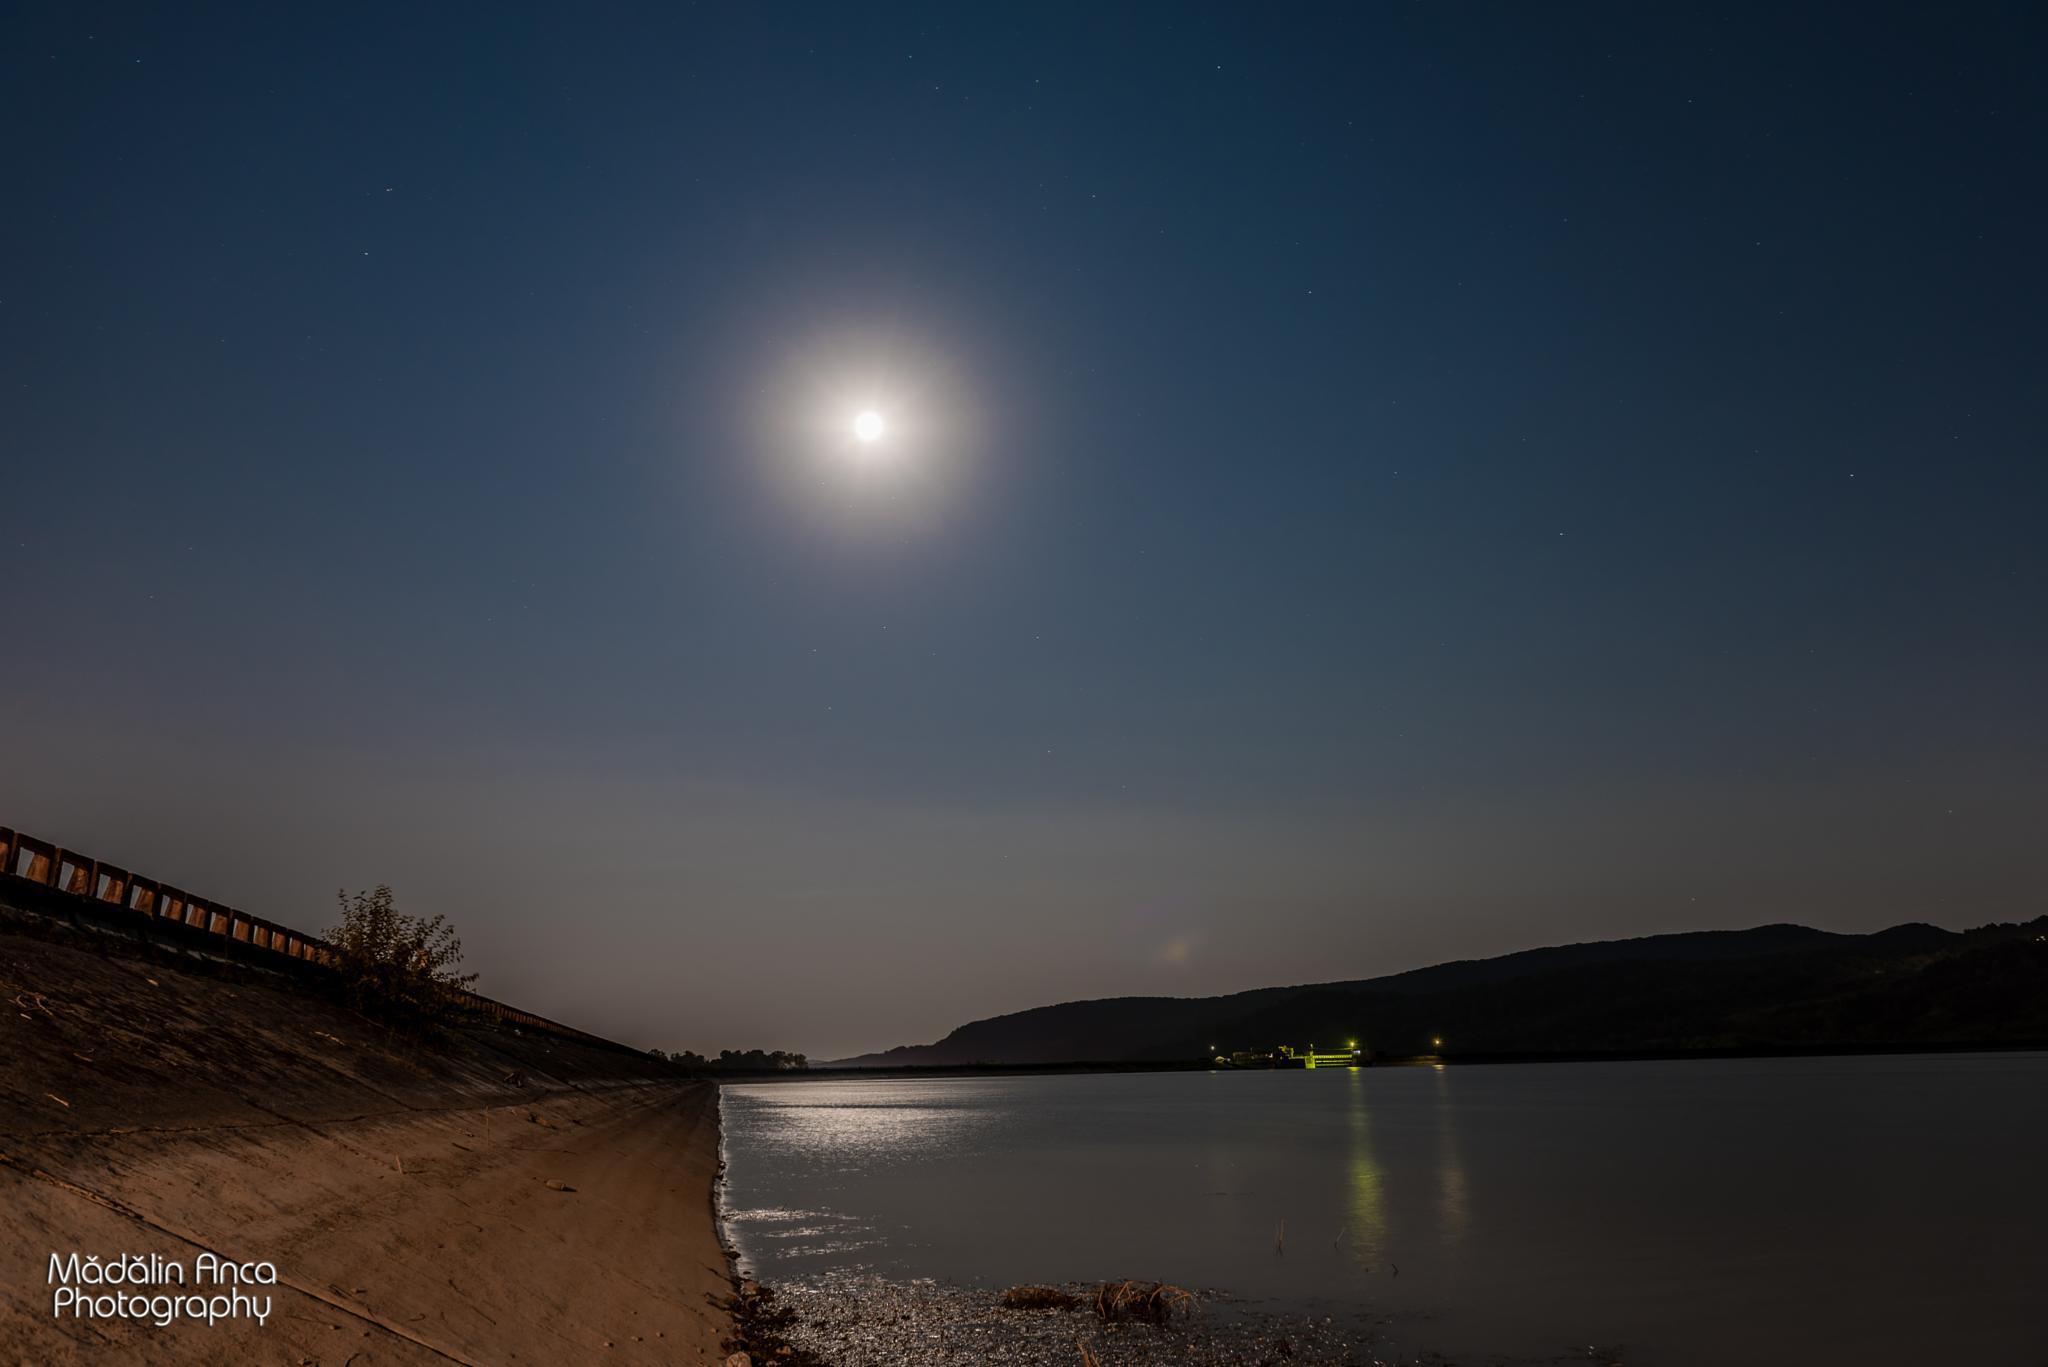 Mandra Luna by Mădălin Anca Photographer